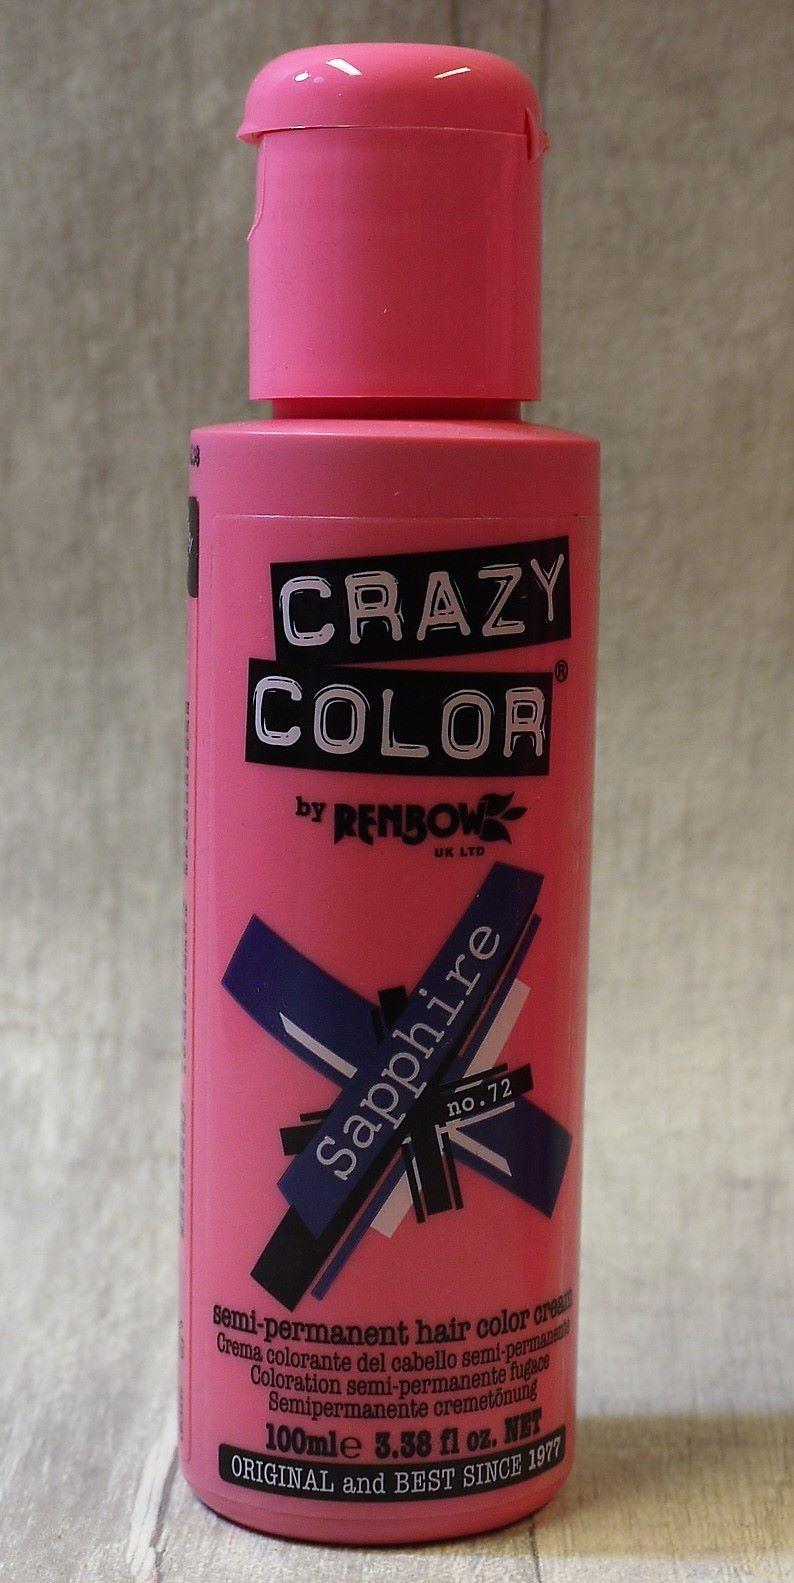 Sapphire Crazy Color